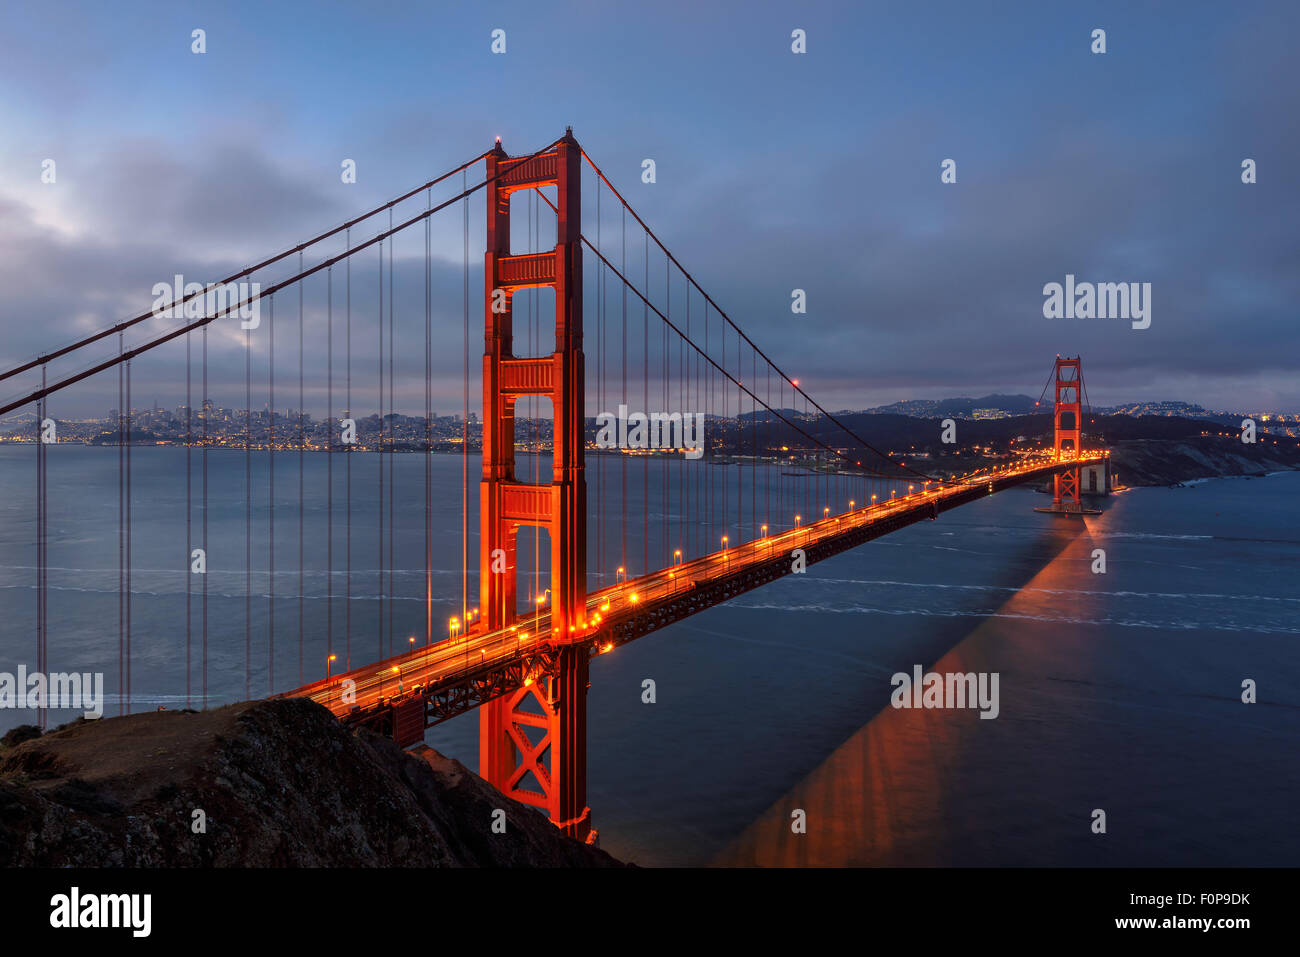 Famous Golden Gate Bridge, San Francisco at morning, USA - Stock Image